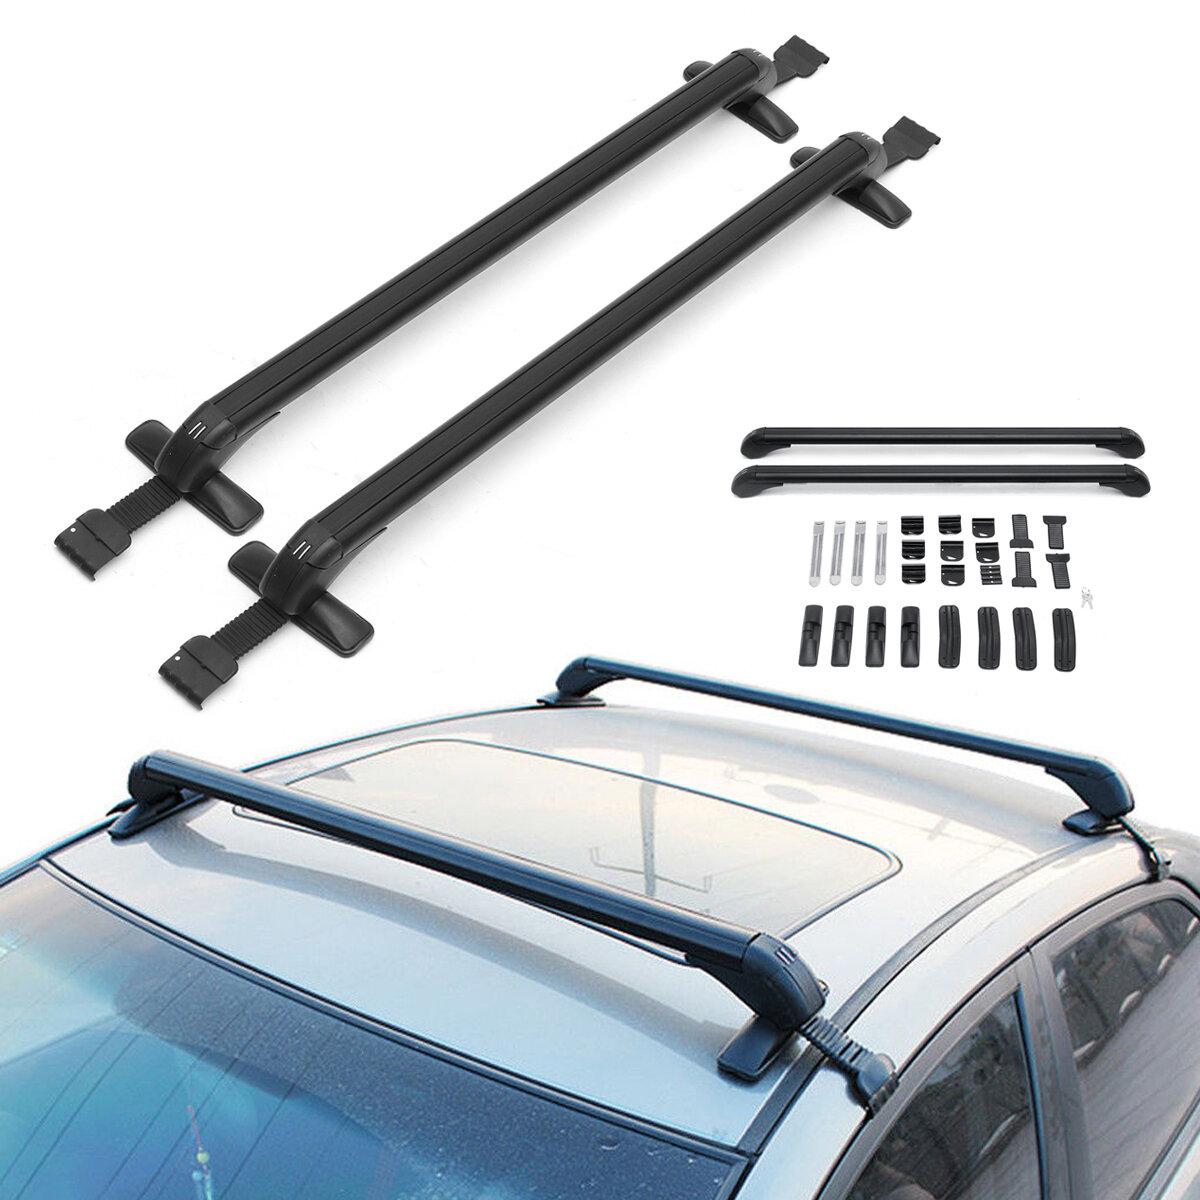 Pair 105cm Roof Cargo Rack Cross Bars Luggage Carrier Holder Anti-theft Car SUV